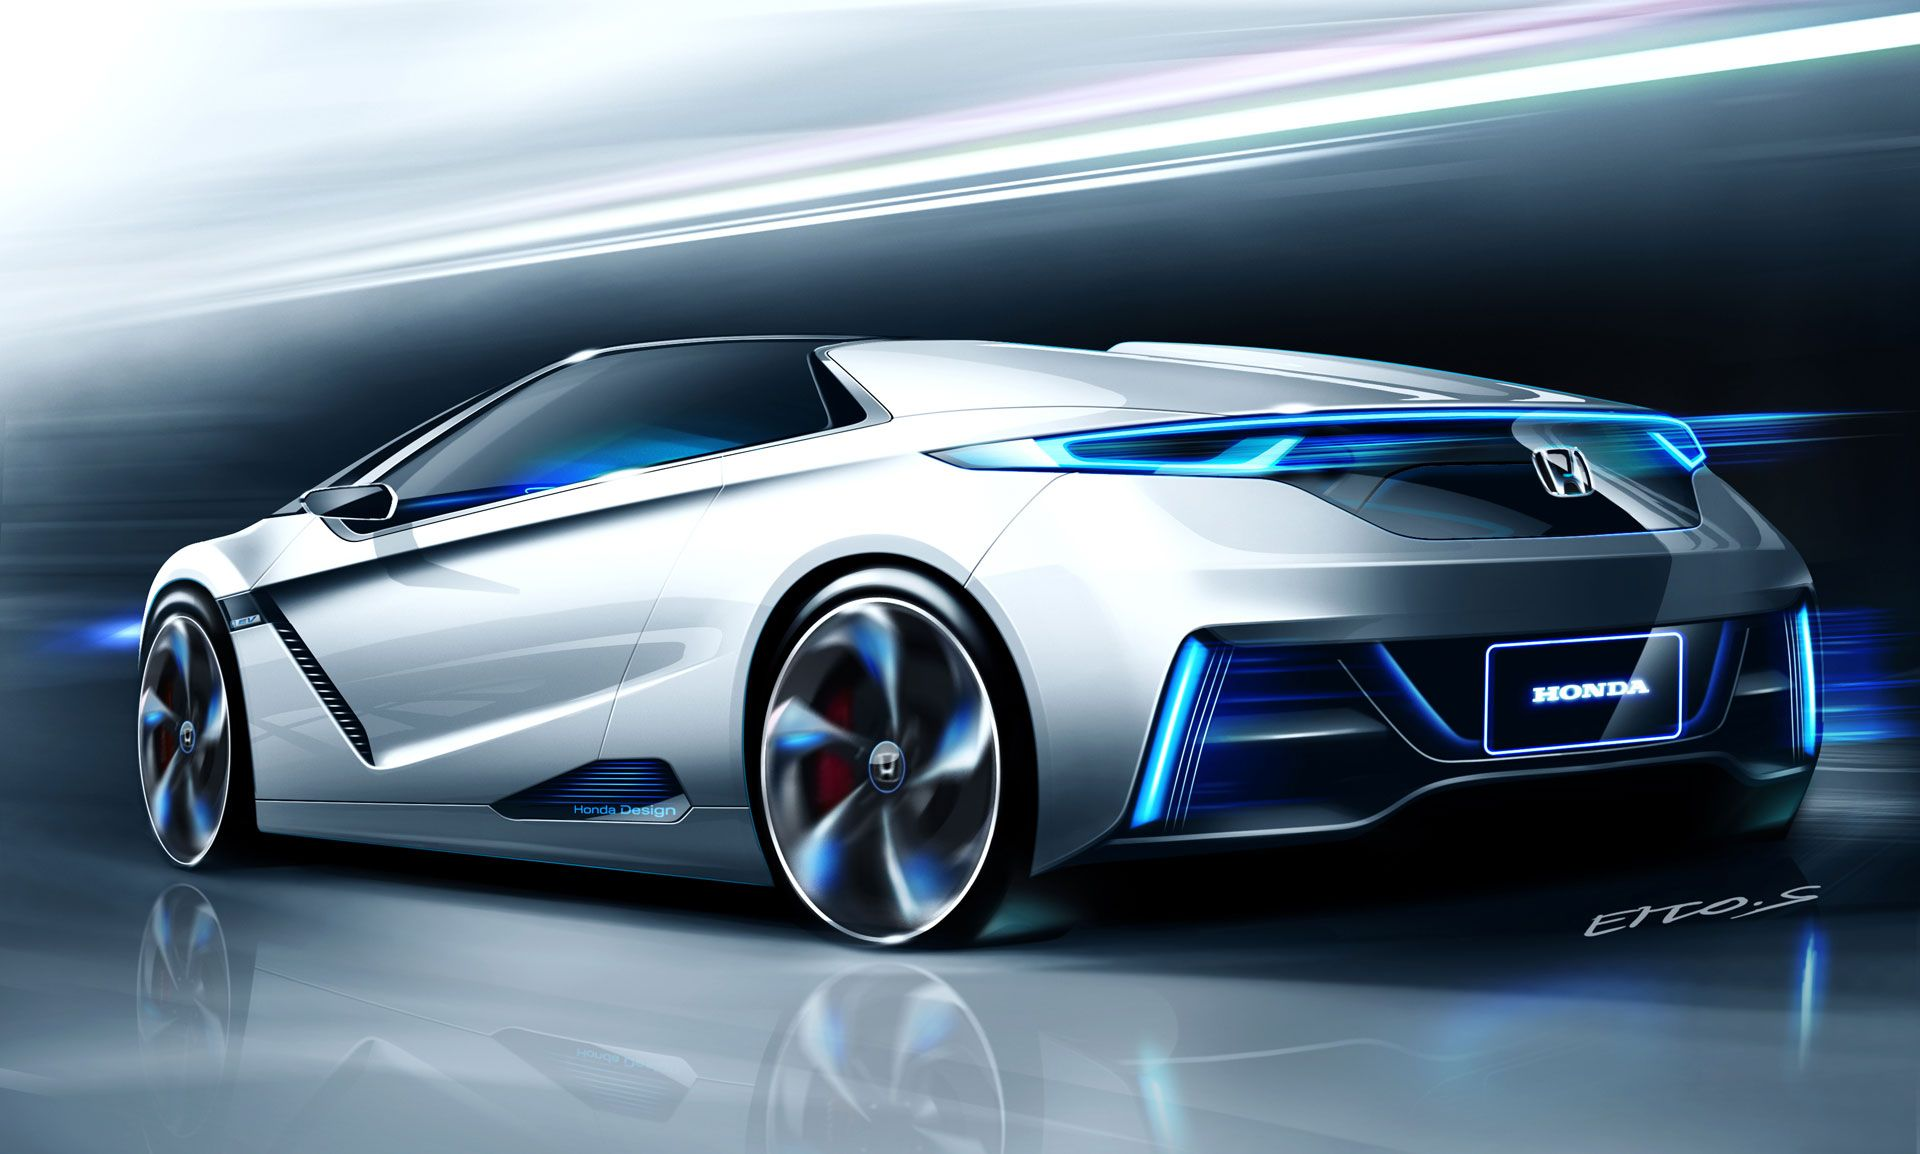 Honda Ev Ster Concept Design Sketch Car Body Design Id Sketches